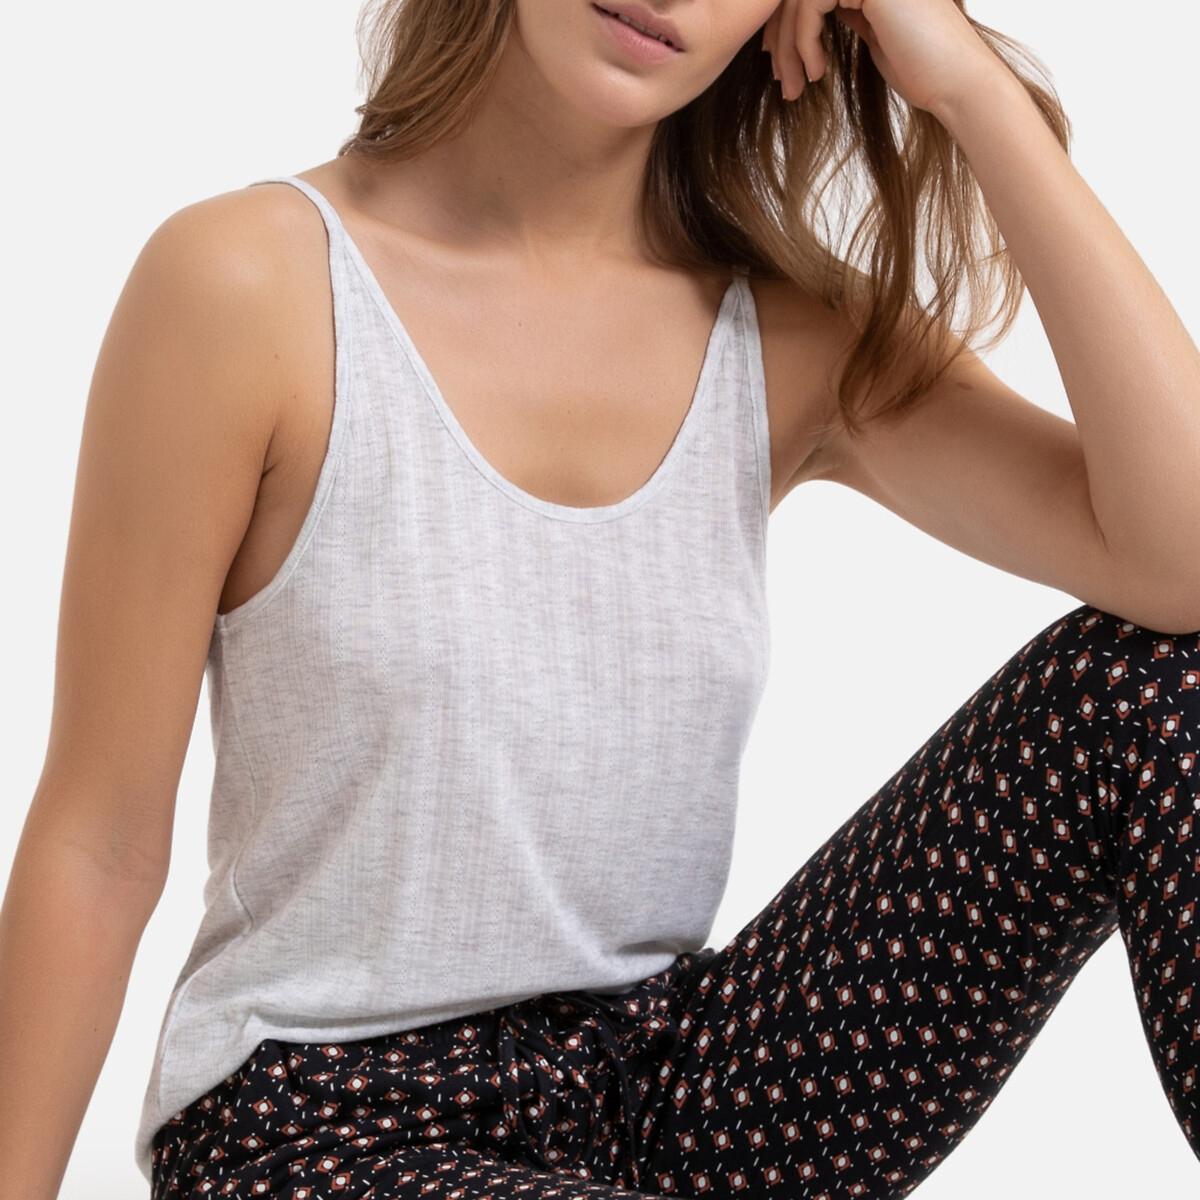 Pijama liso sin mangas, con pantalón estampado